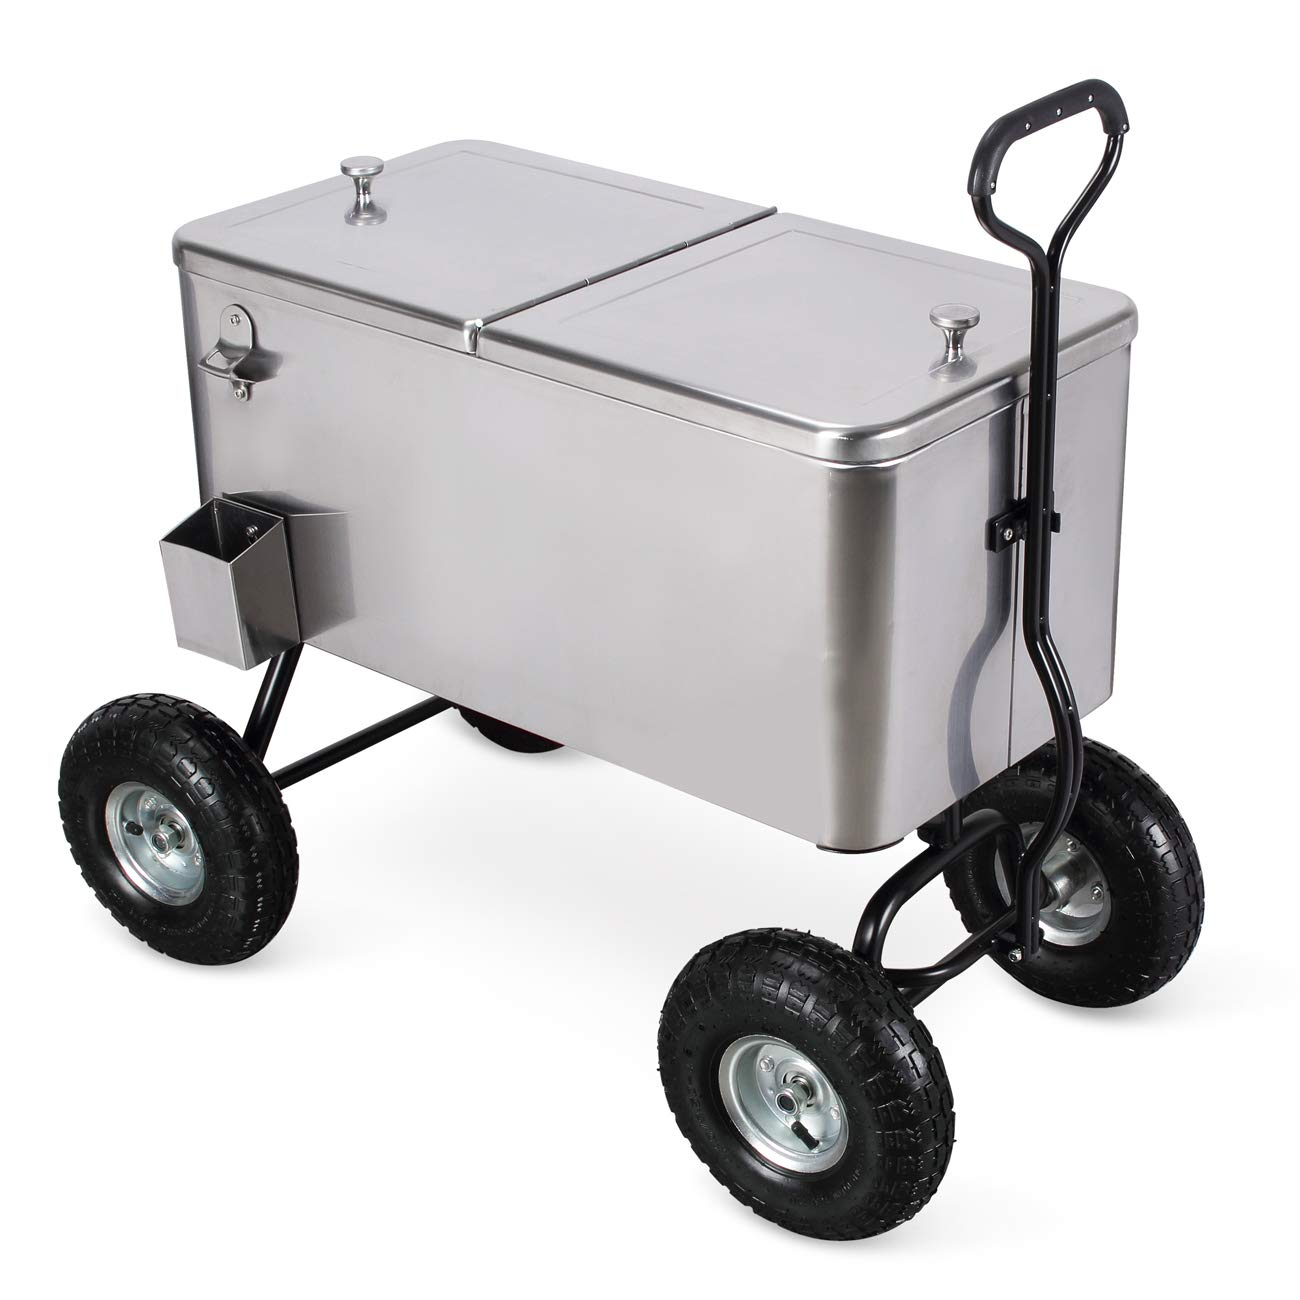 Belleze 80 Qt Portable Rolling 10' All Terrain Wheels Outdoor Backyard Party Beach Drink Cooler Wagon, Stainless Steel